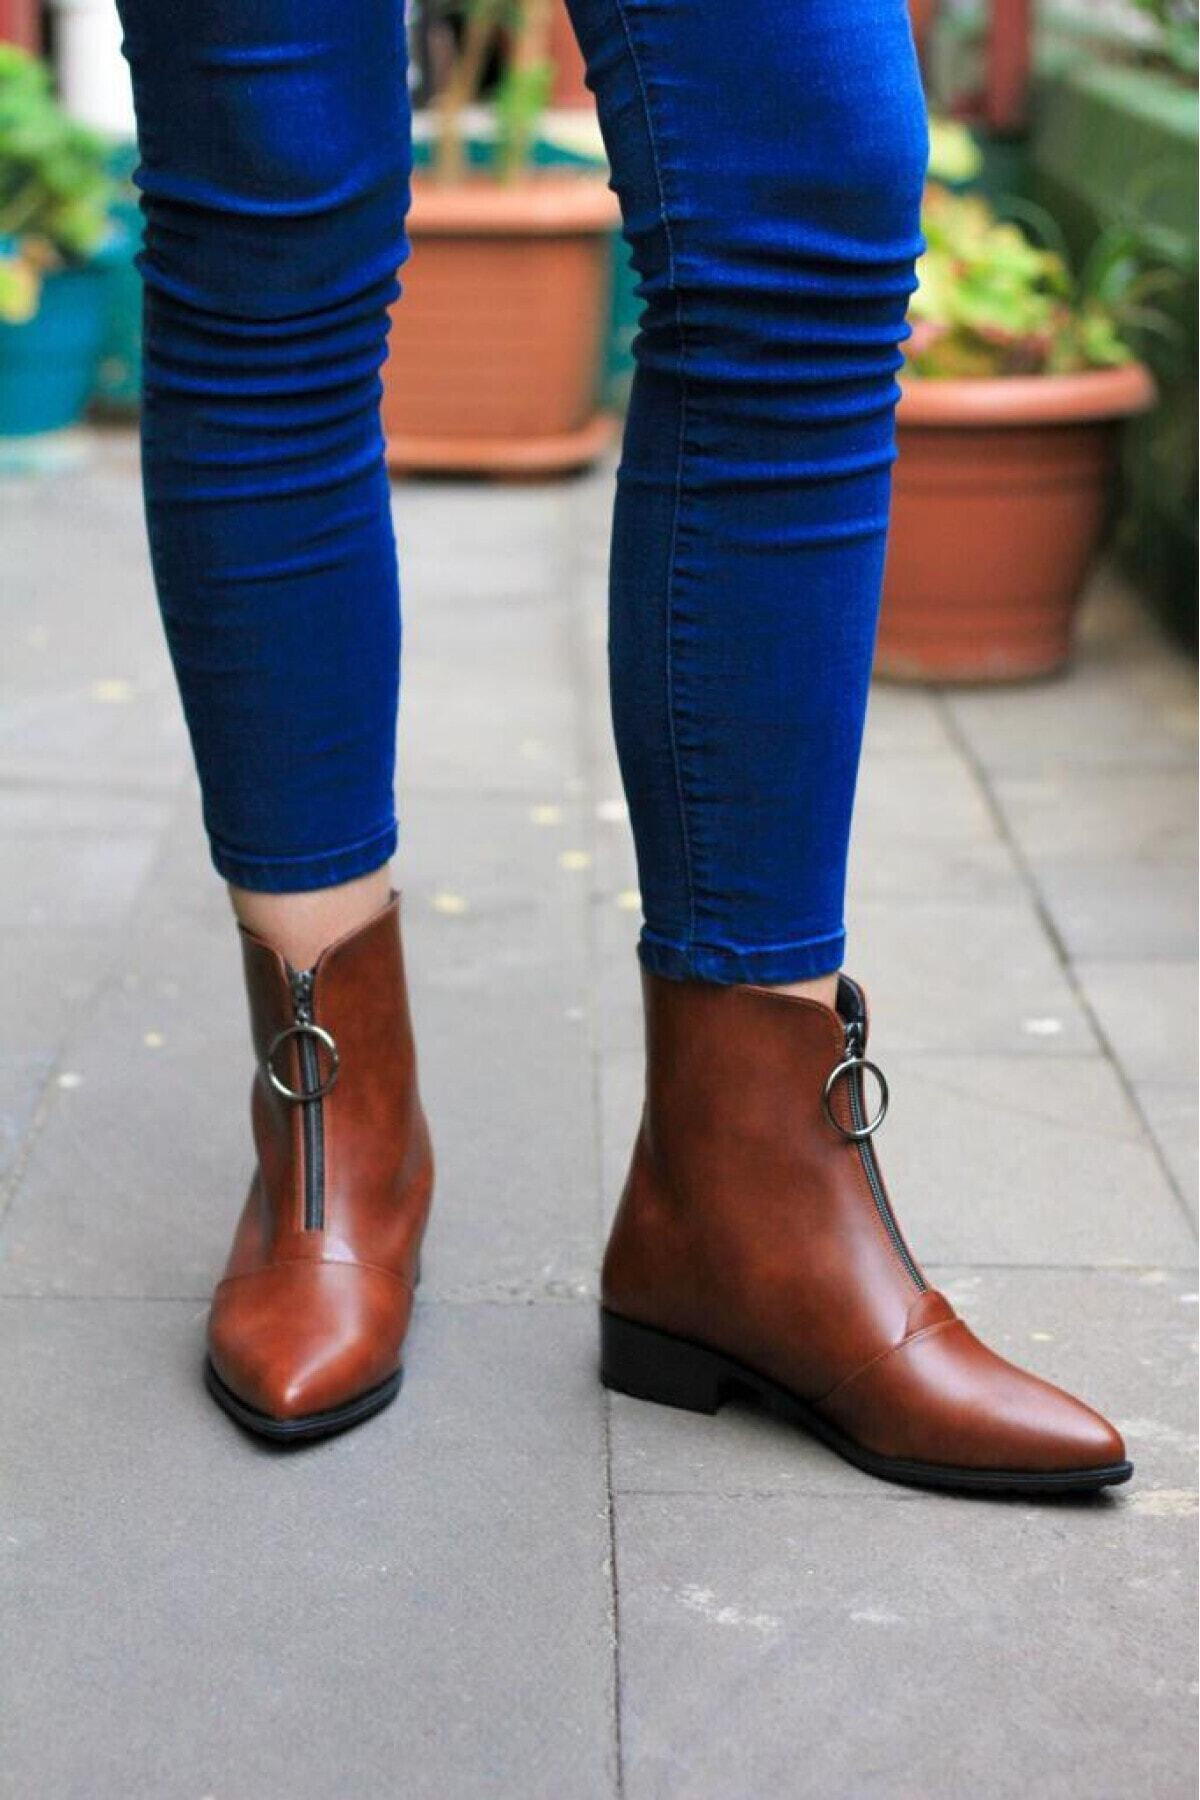 S&S Kadın Kahverengi Cilt 3cm Topuklu Bot 1